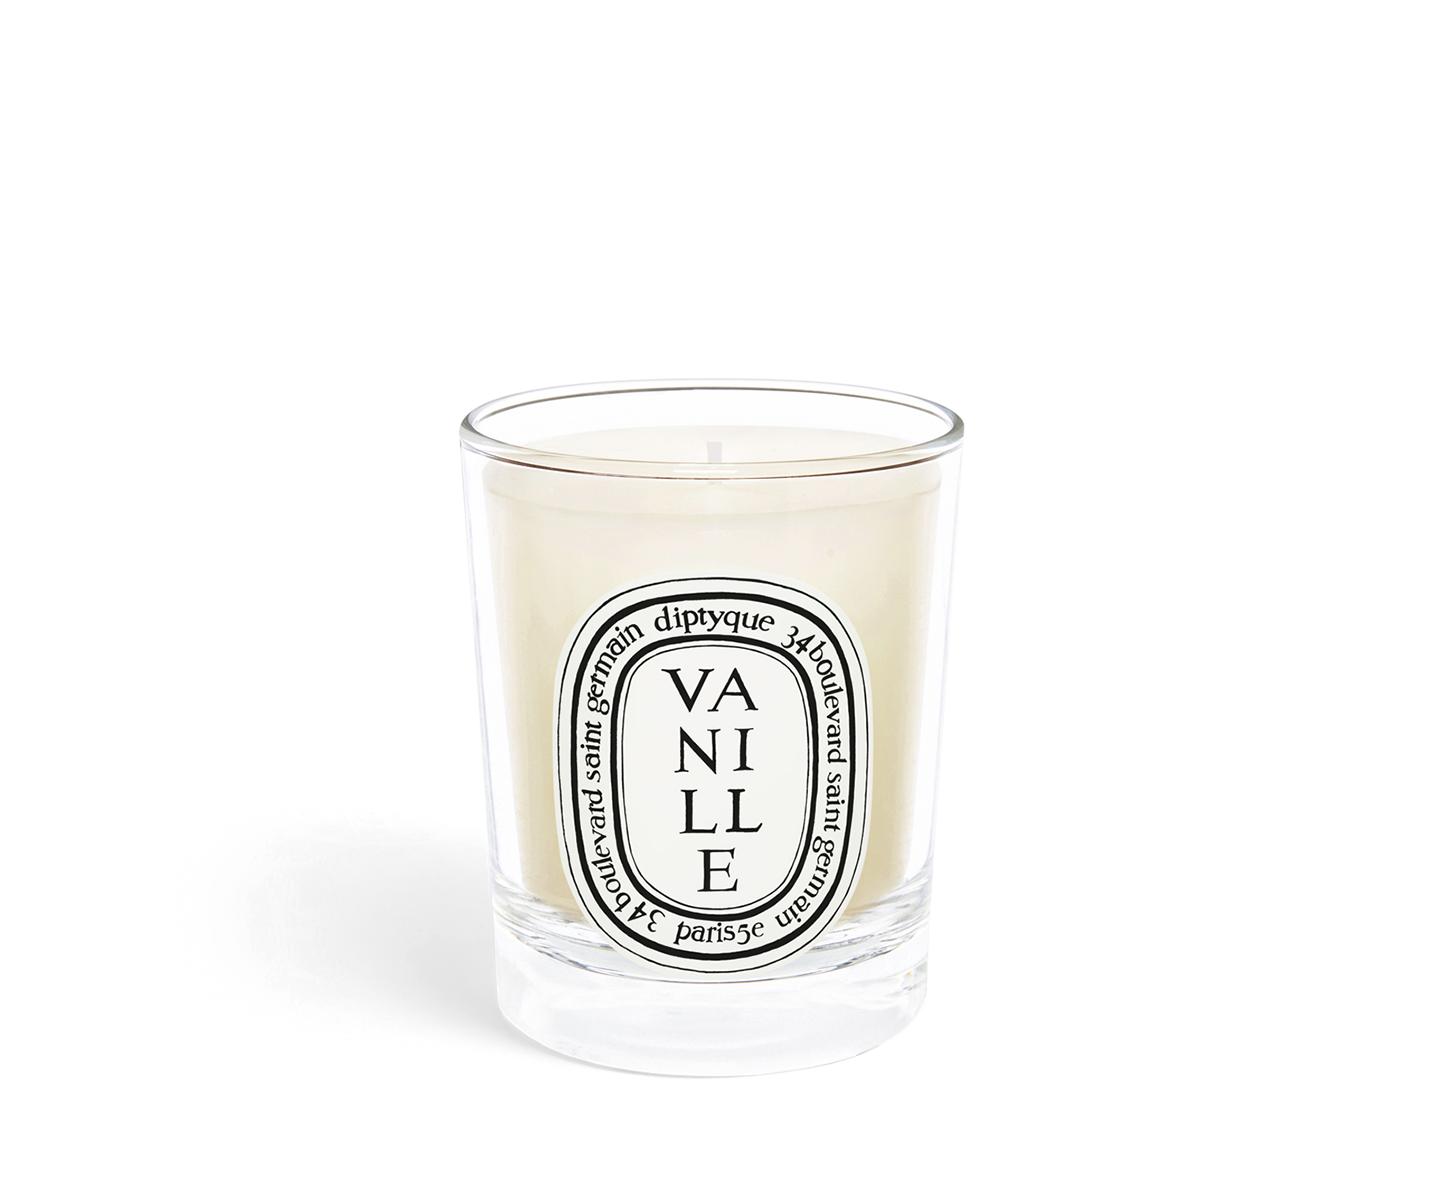 Vanille / Vanilla small candle